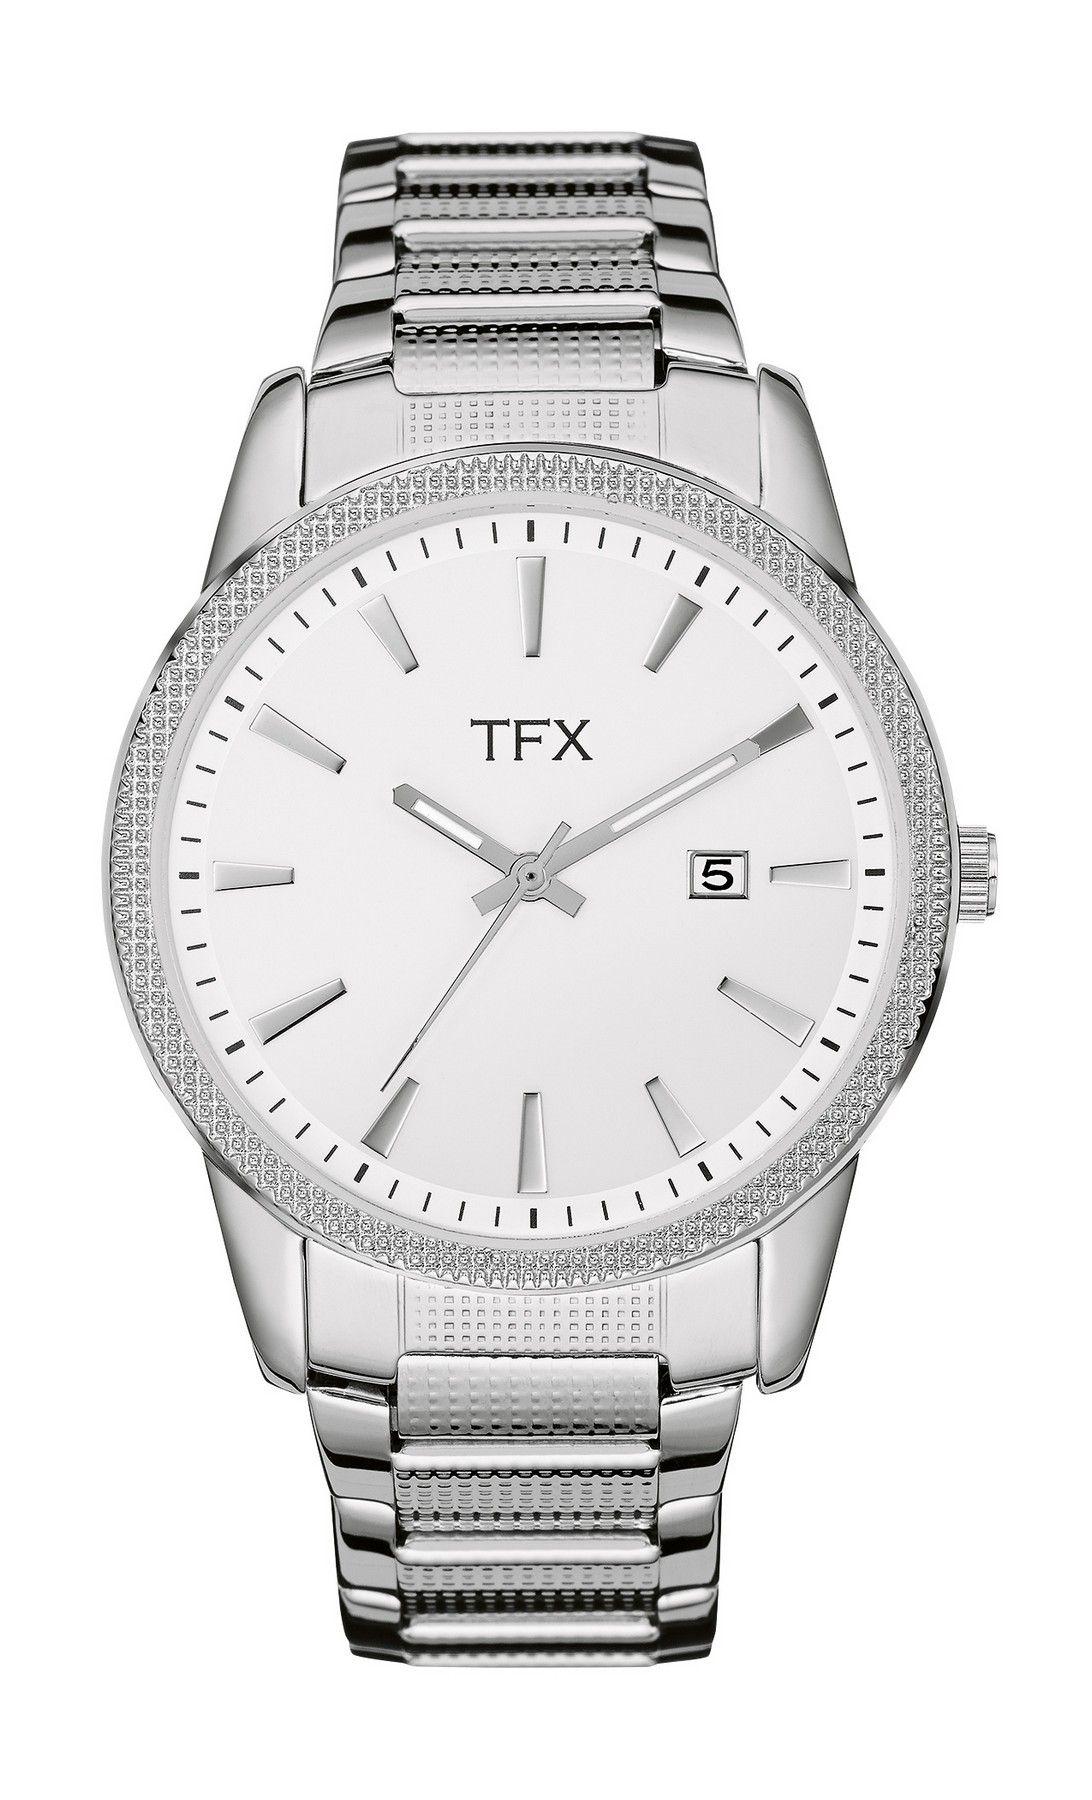 36A105 Bulova TFX Collection Men's Round Dial Steel Bracelet Watch w/ Swarovski Crystals